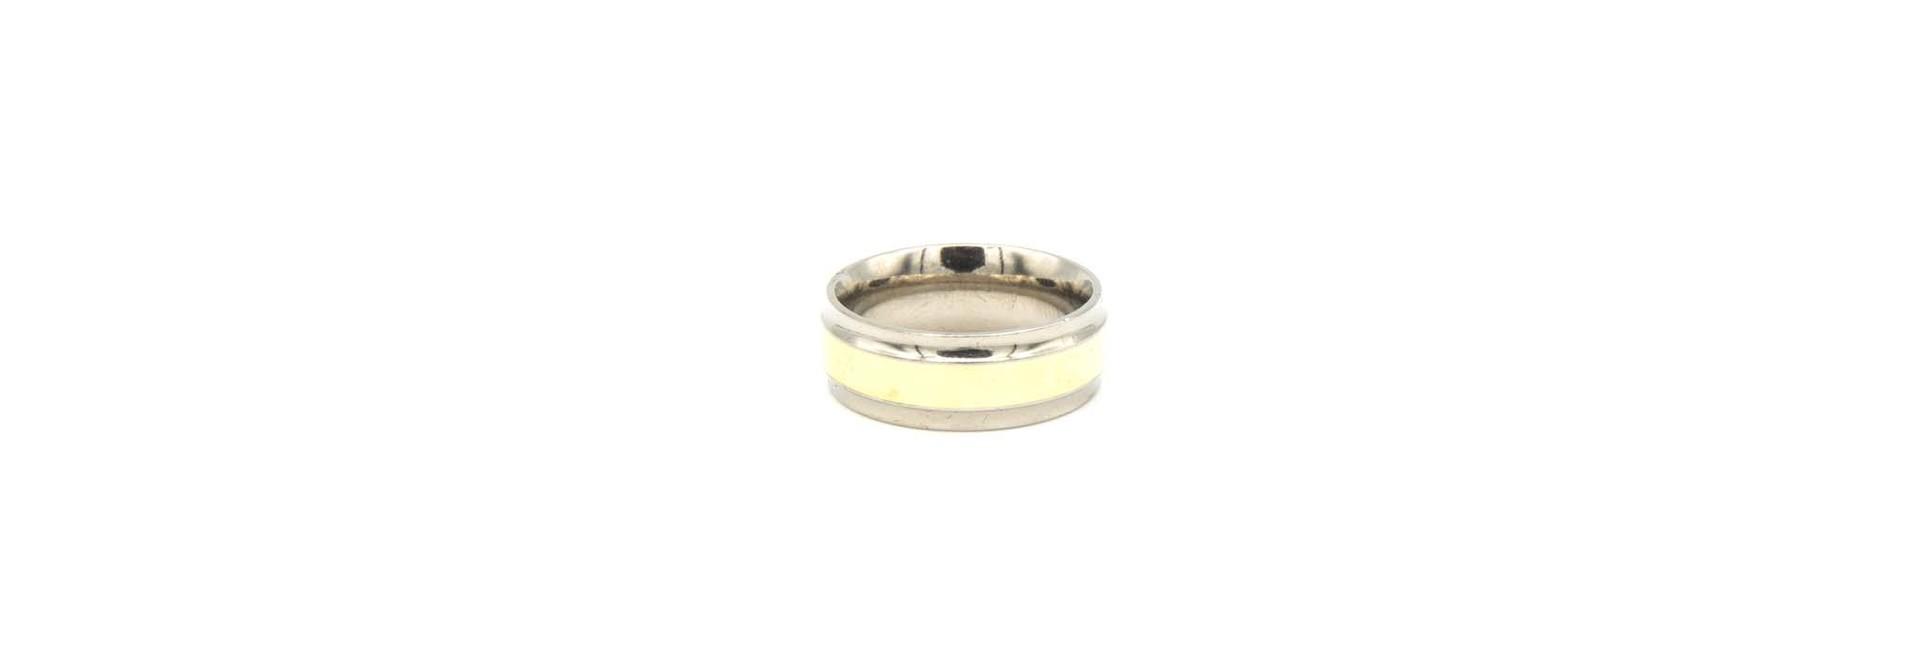 Ring geelgoud met titanium